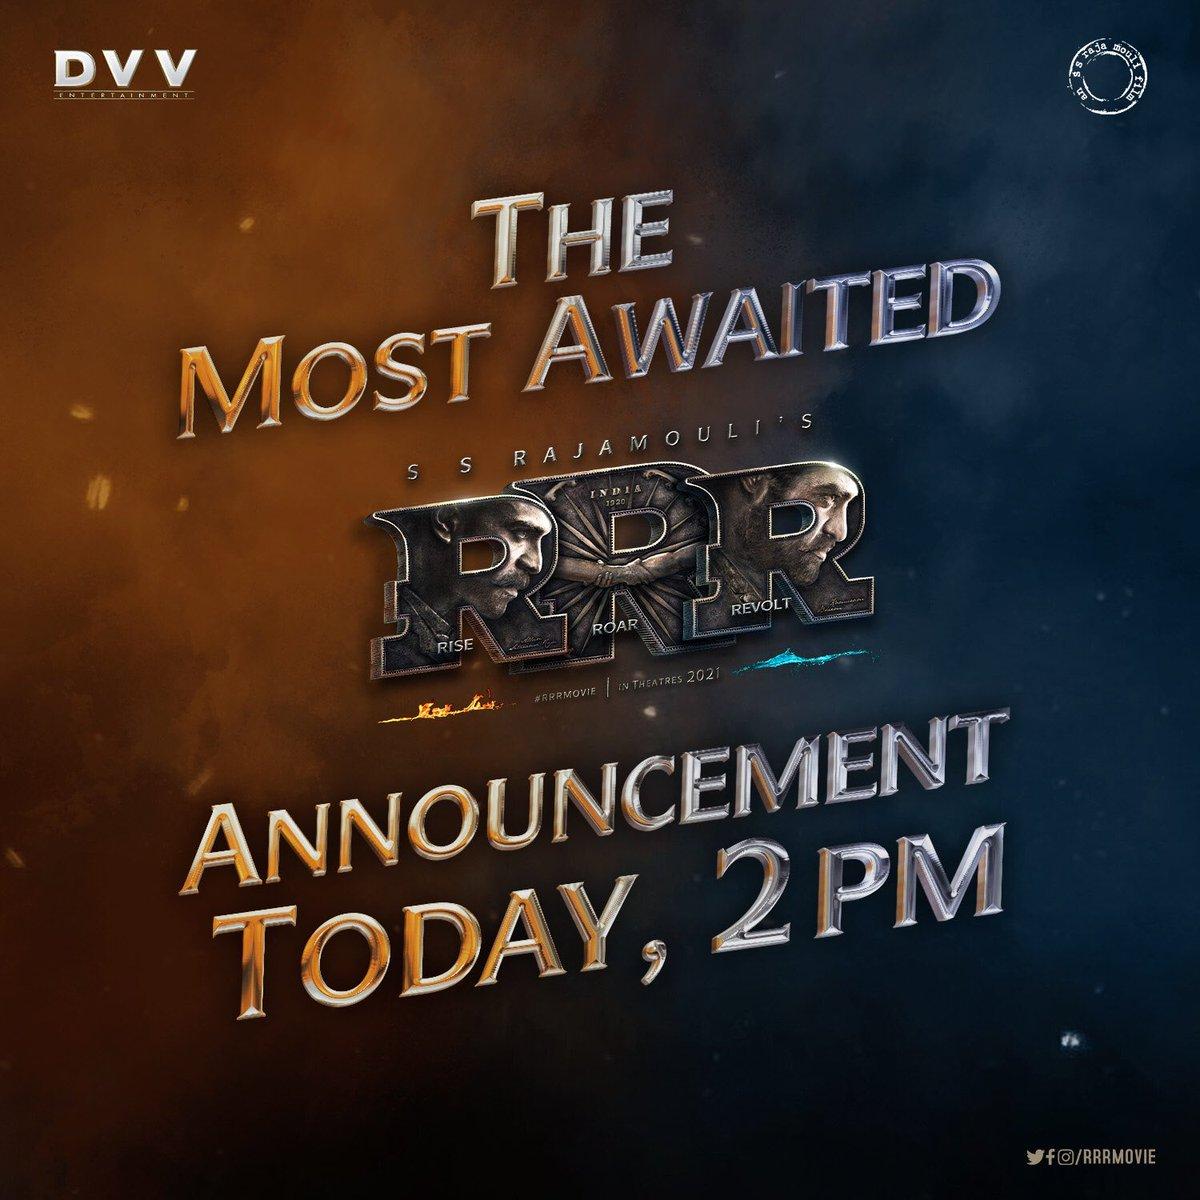 An announcement that you all have been waiting for will be at 2 PM, Today. Stay Tuned. 🔥🌊✊🏻  #RRRMovie #RRR  @ssrajamouli @tarak9999 @AlwaysRamCharan @ajaydevgn @aliaa08 @oliviamorris891 @RRRMovie @DVVMovies